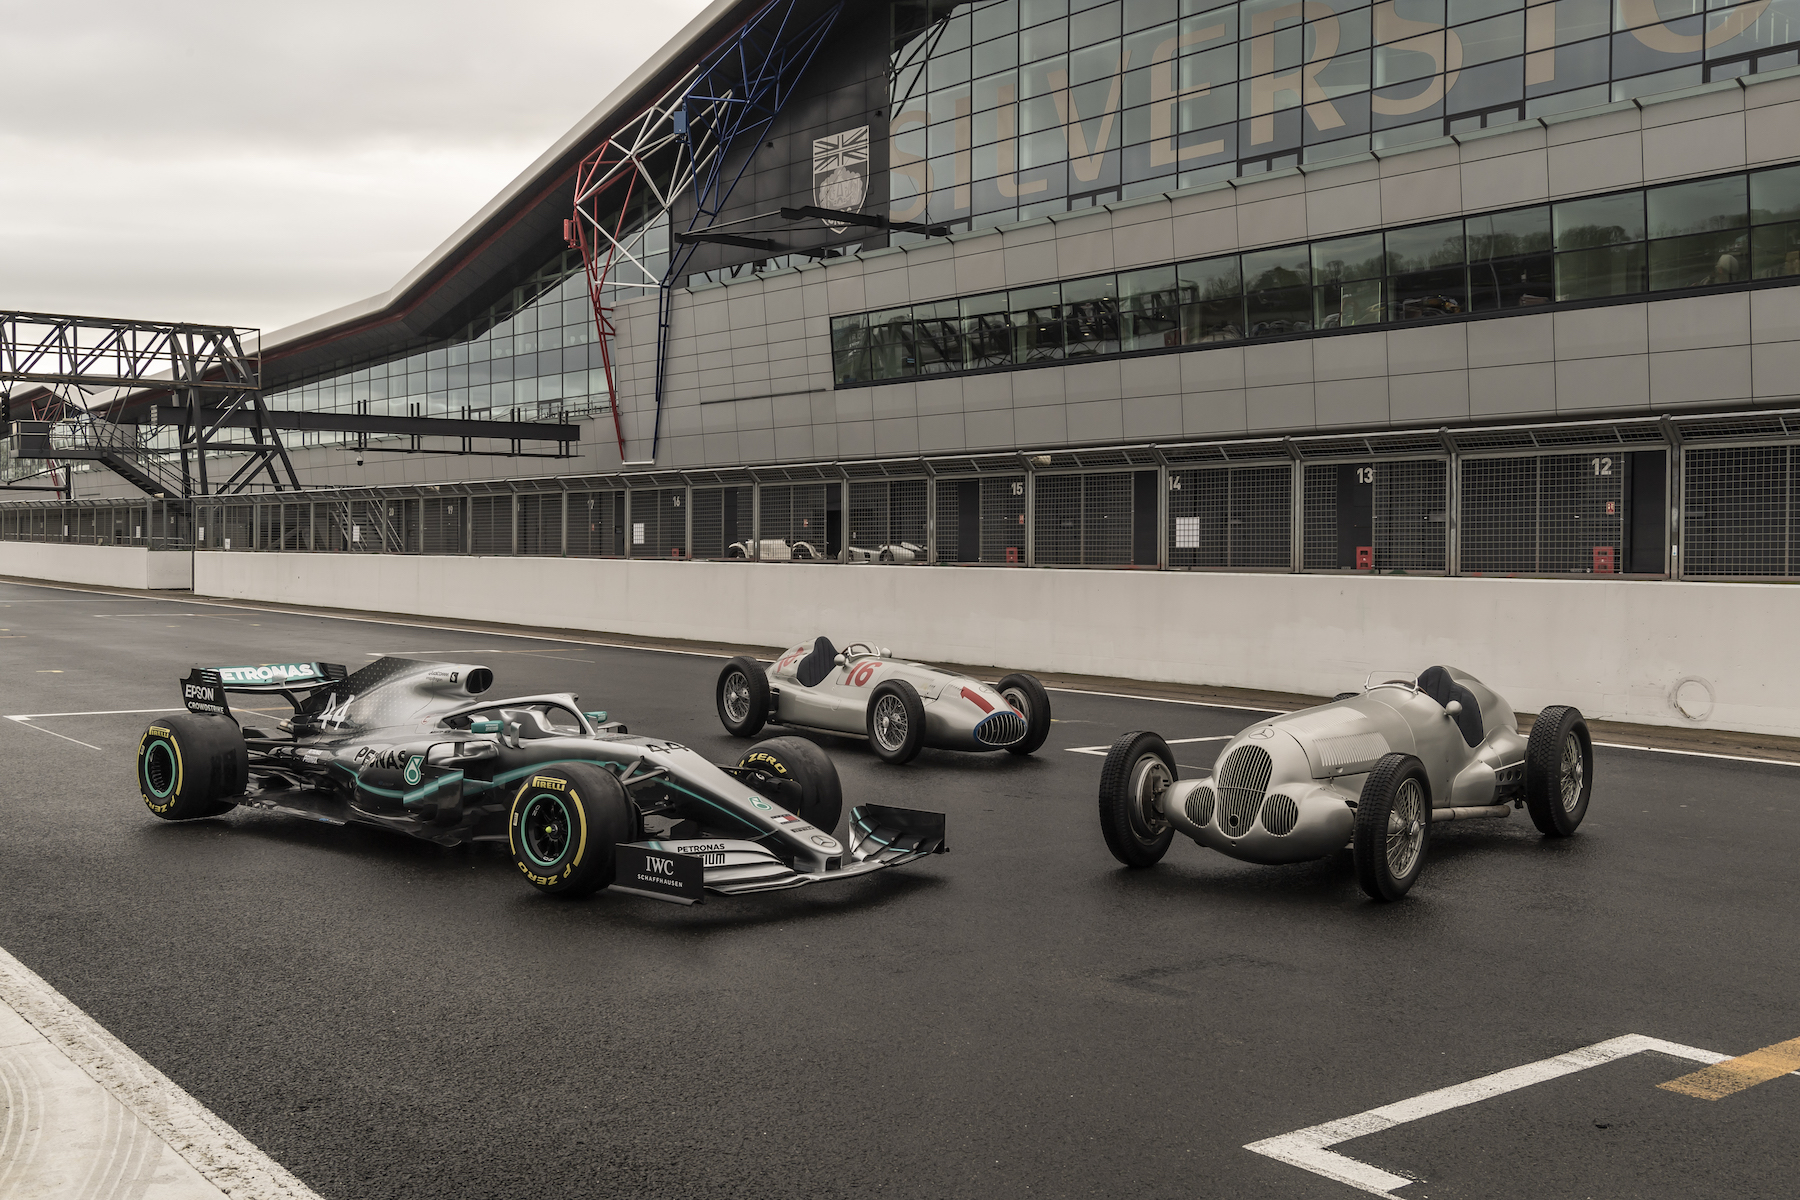 2019 Mercedes 125 years in Motorsports celebration | 2019 Silverstone 19.jpg